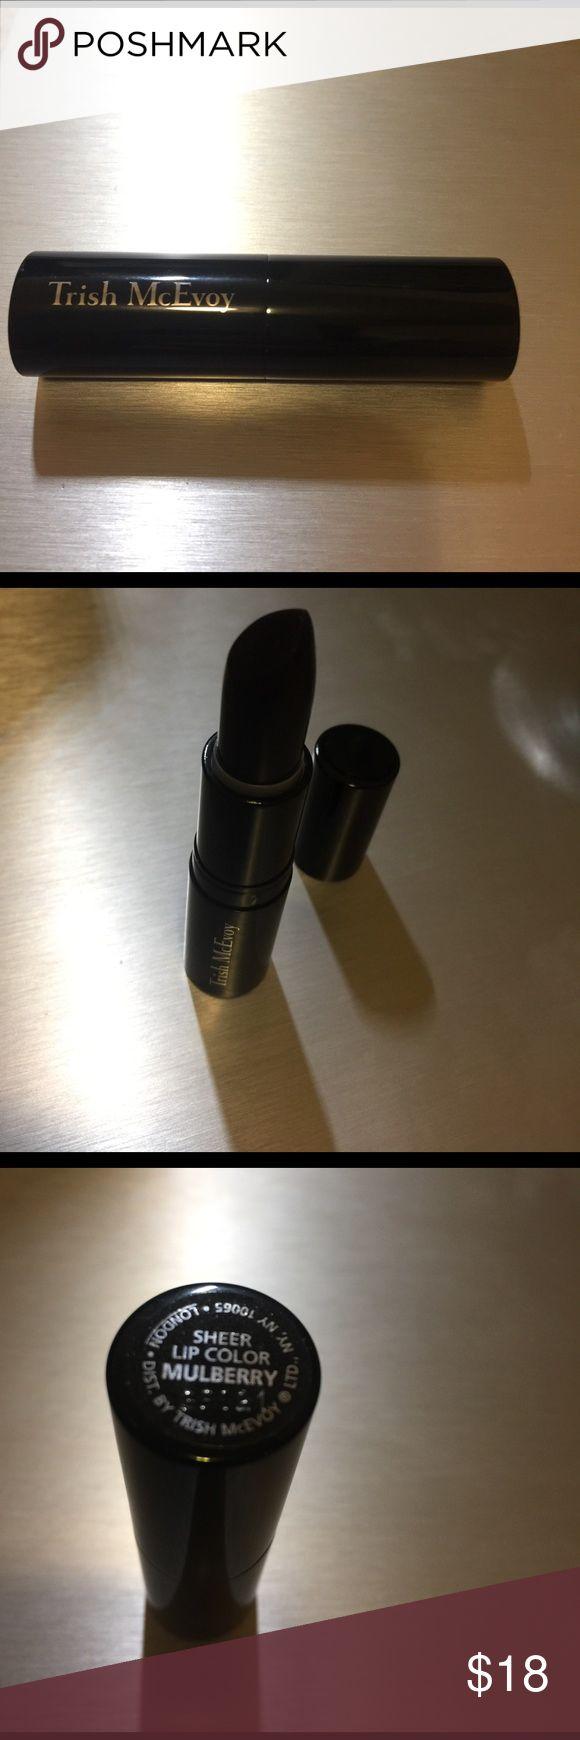 Trish MCEvoy dark plum color lipstick Sheer finish, could be lighter plum or deep grunge color Sephora Makeup Lip Balm & Gloss